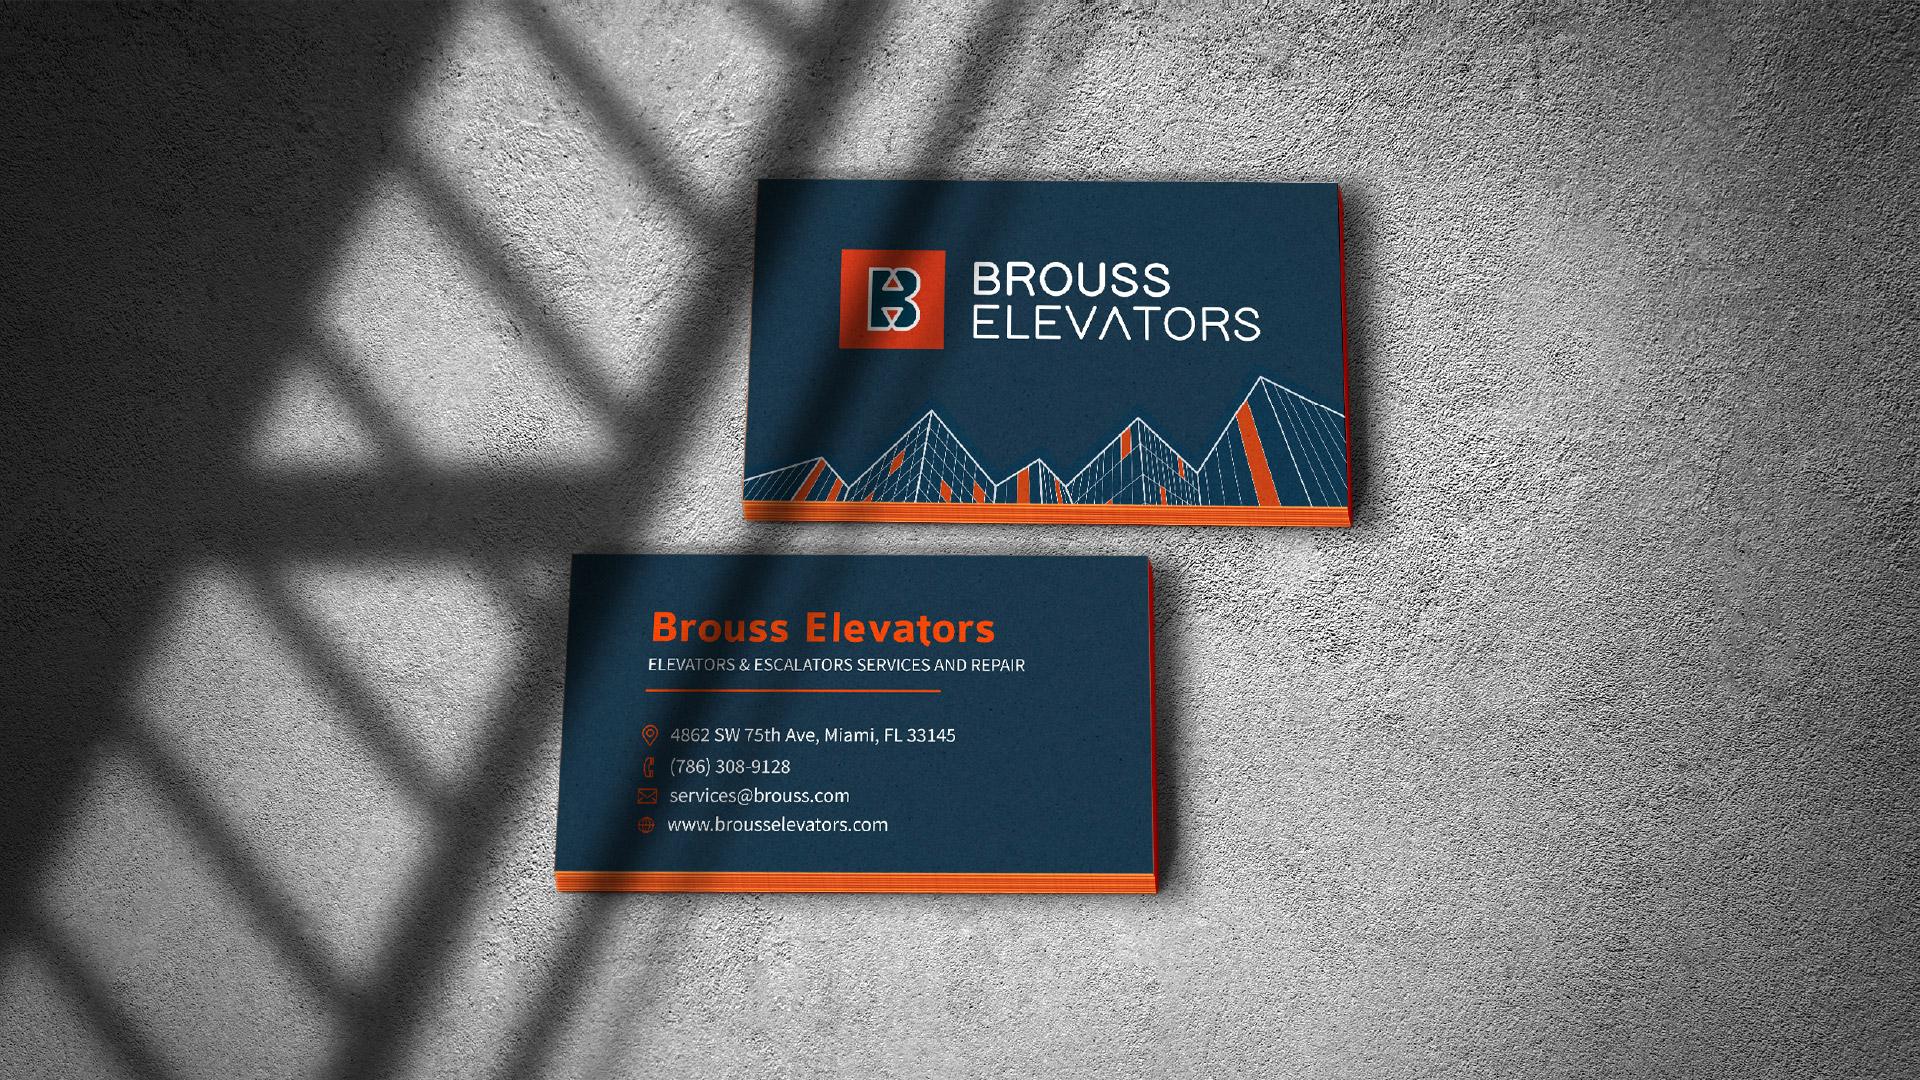 Brouss Elevators business cards design by Kinetik Lab